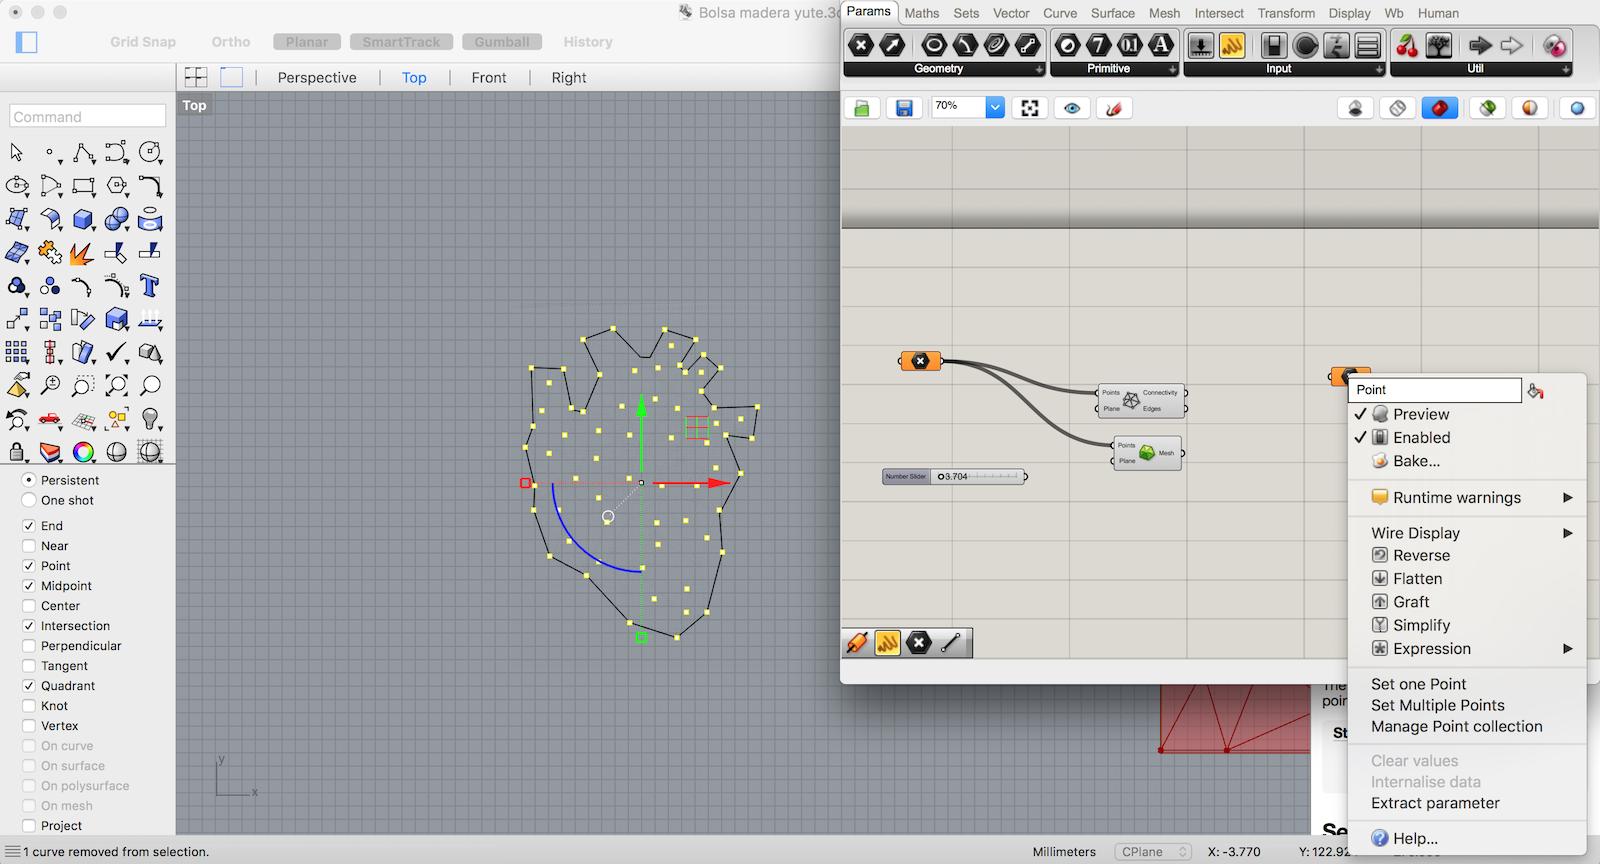 W9_Parametric heart 1.png